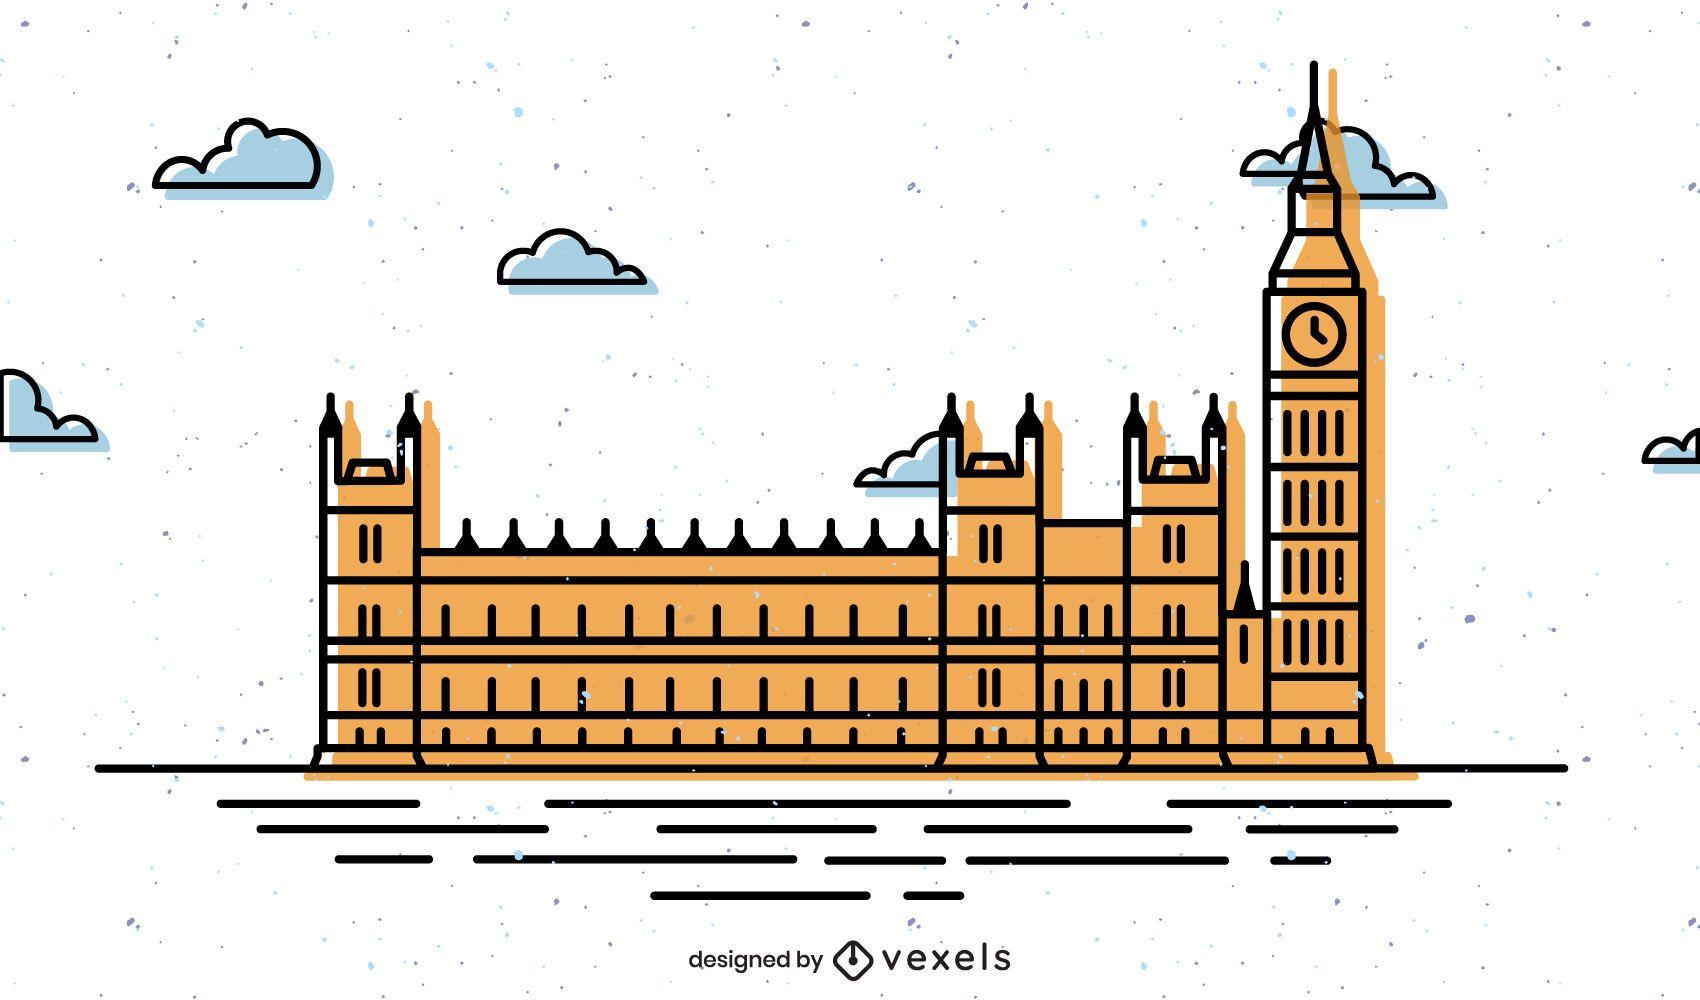 Parliament of the united kingdom illustration